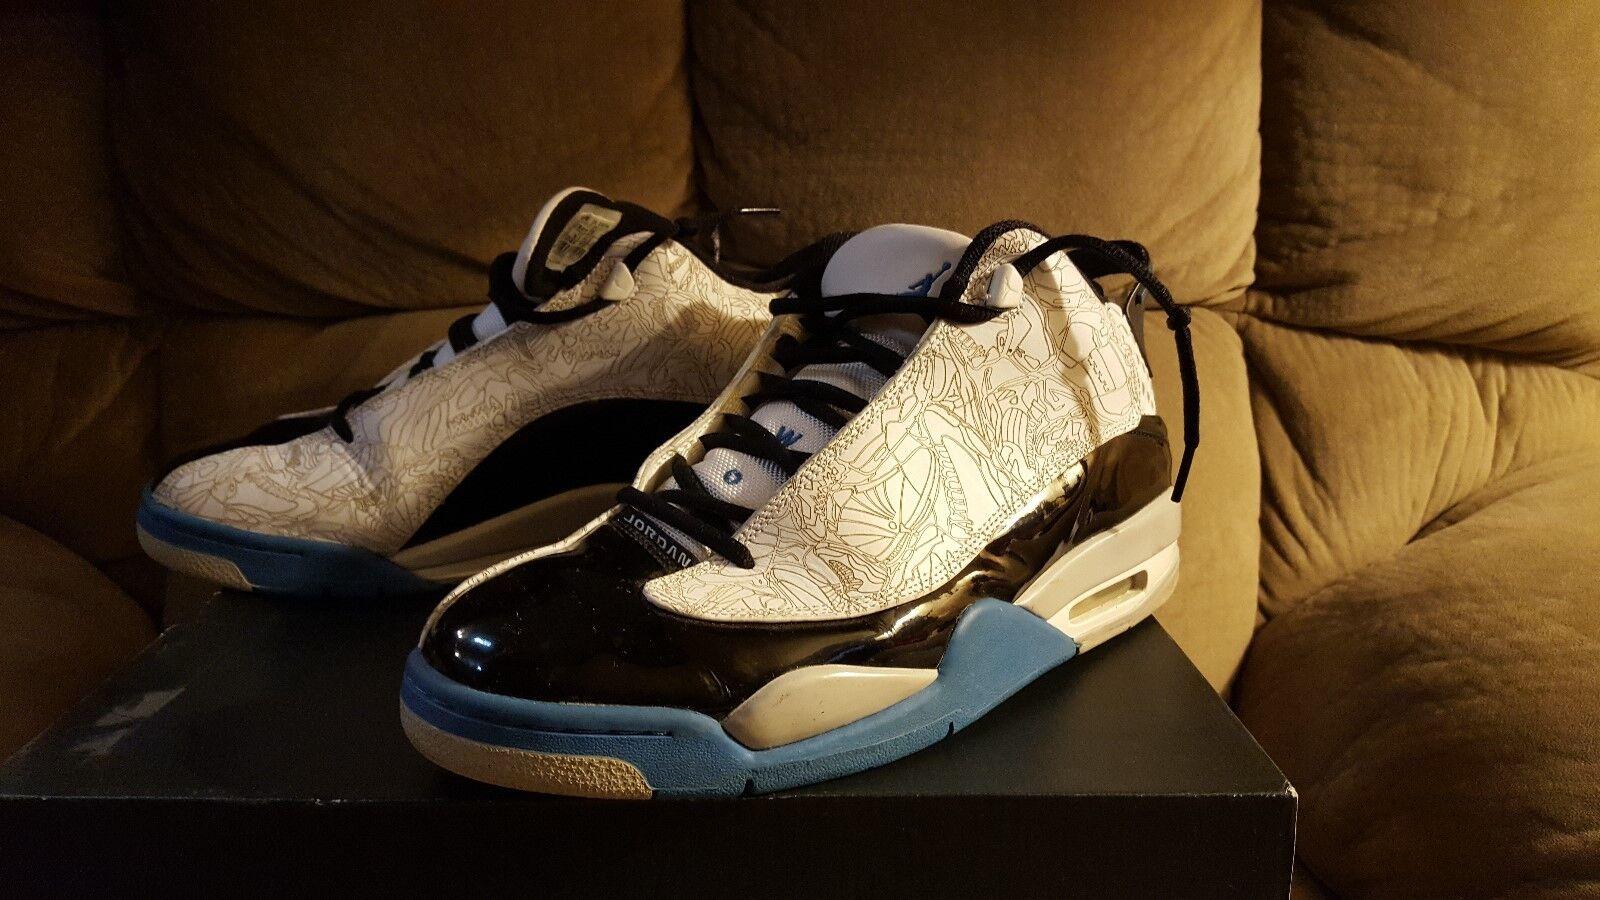 2005 Nike Air Jordan DUB-ZERO XX 20 blanc  Noir PHOTOBleu LASER 311046-102 10.5